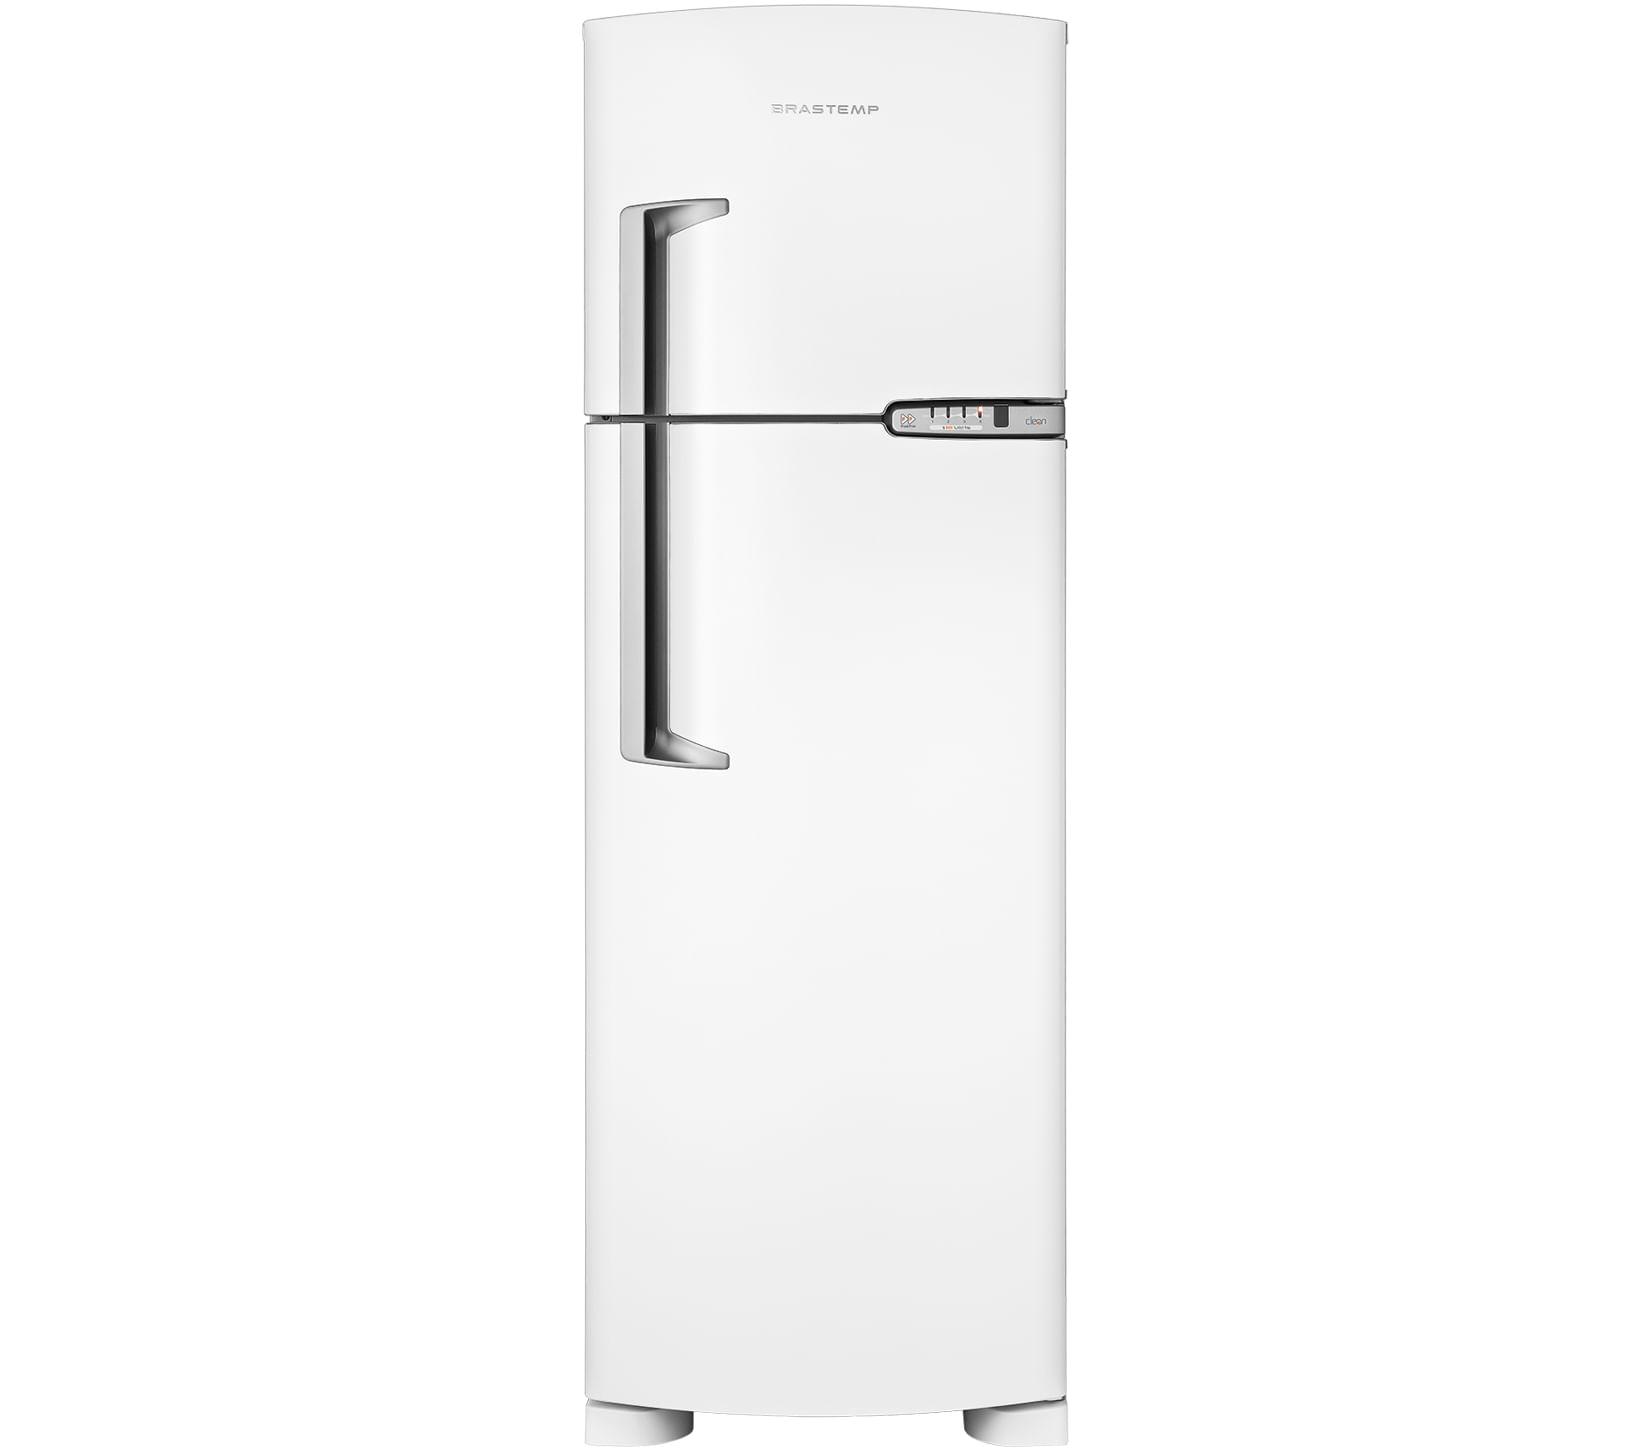 Geladeira Brastemp Frost Free Duplex 378 litros Branca com Porta-Latas